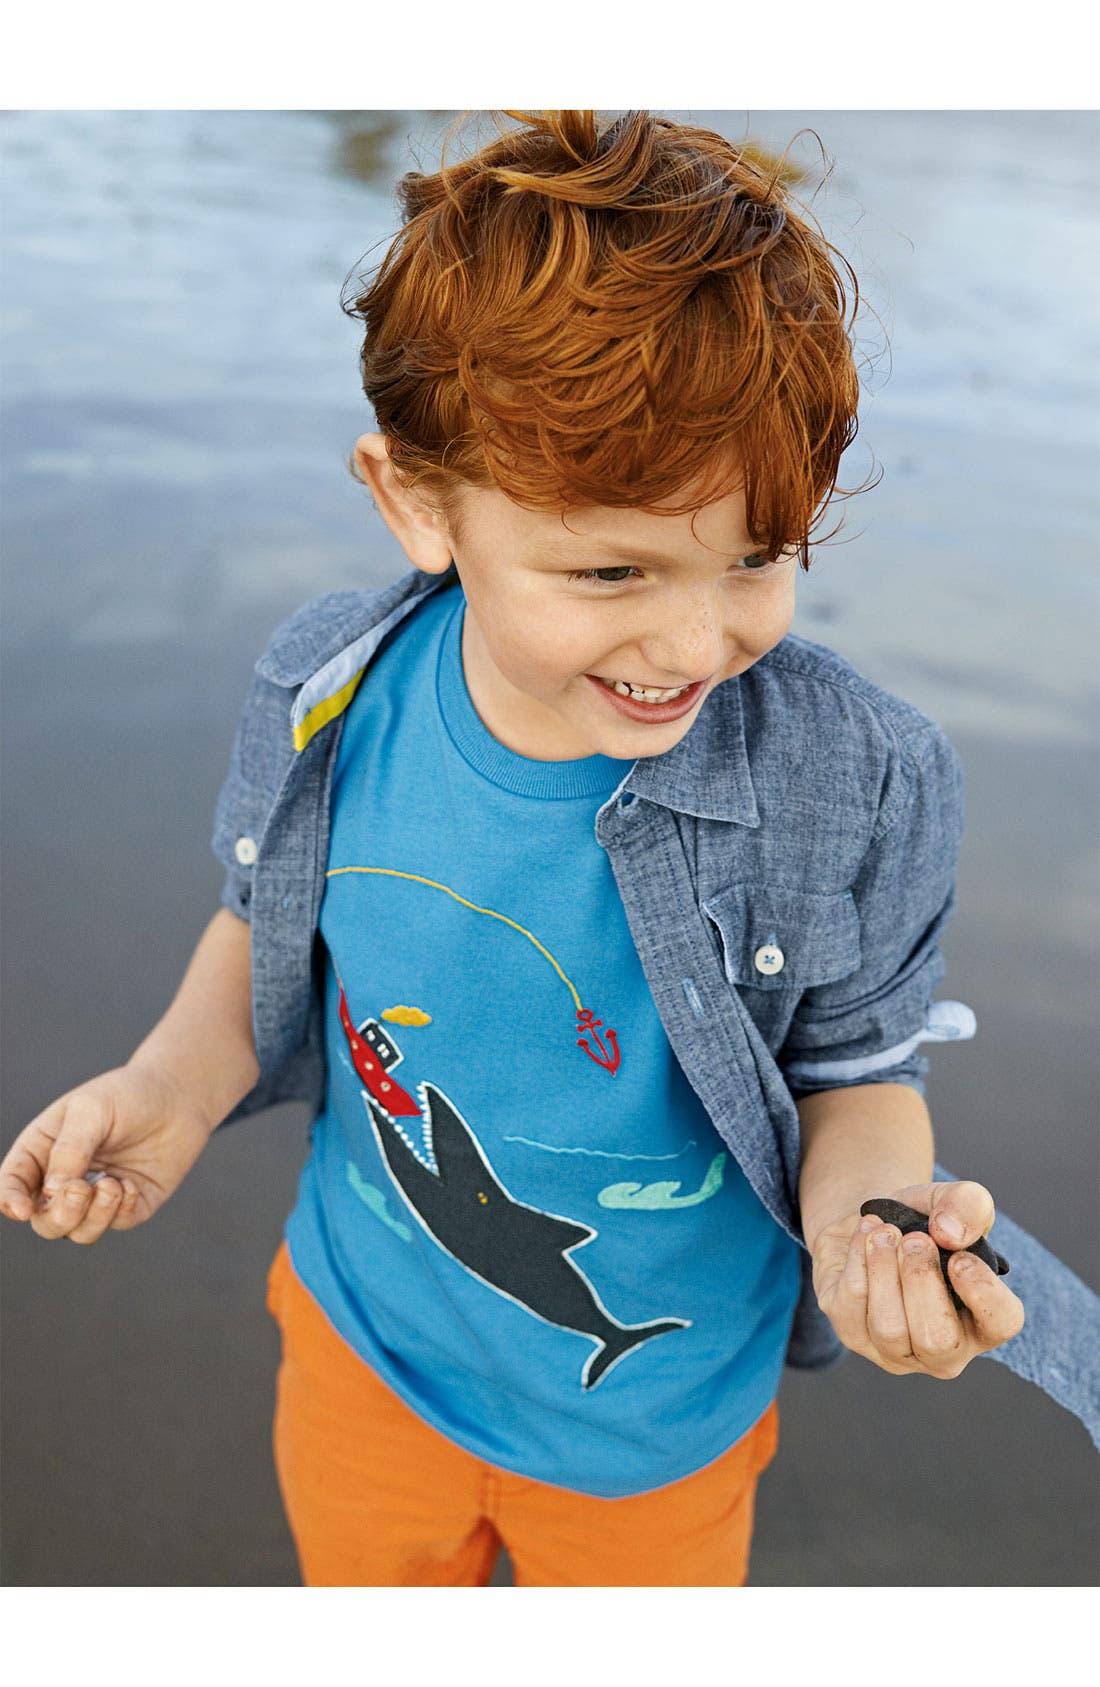 Alternate Image 1 Selected - Mini Boden T-Shirt, Woven Shirt & Chinos (Toddler, Little Boys & Big Boys)